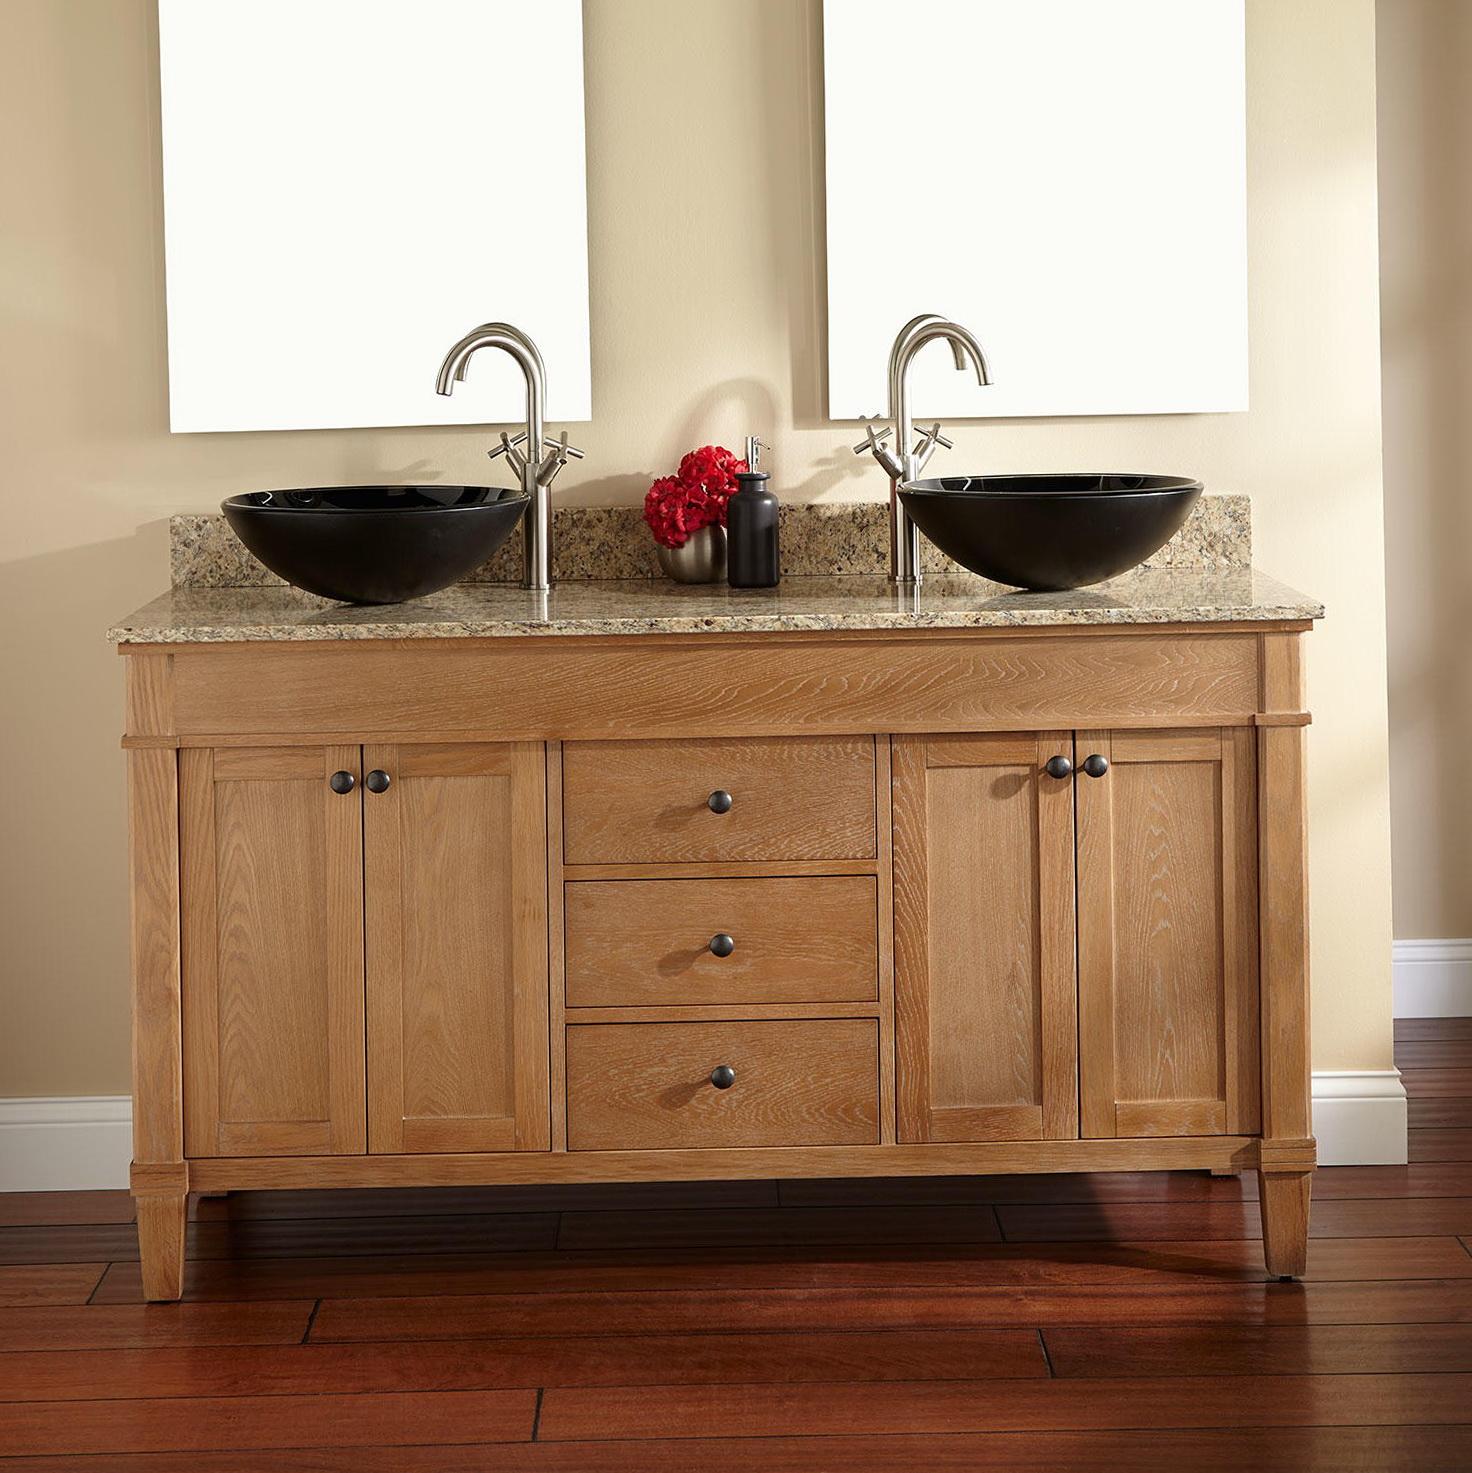 Double bathroom sink plumbing diagram - Bathroom Double Vanity Plumbing Diagram